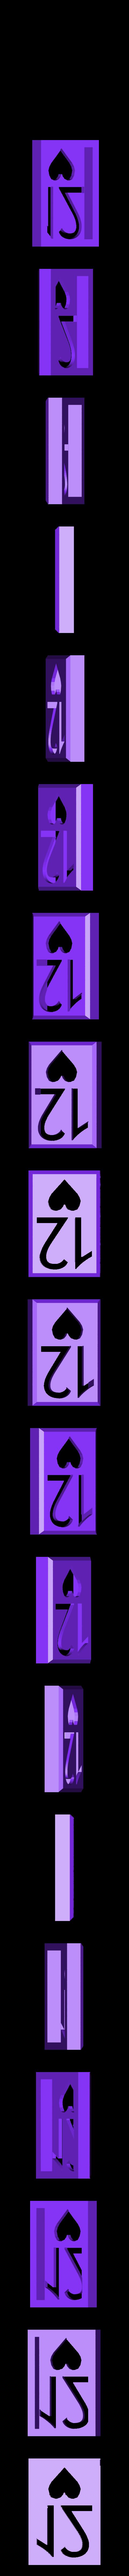 BlockHearts12.stl Download STL file Playing Card Tiles • Object to 3D print, Jinja